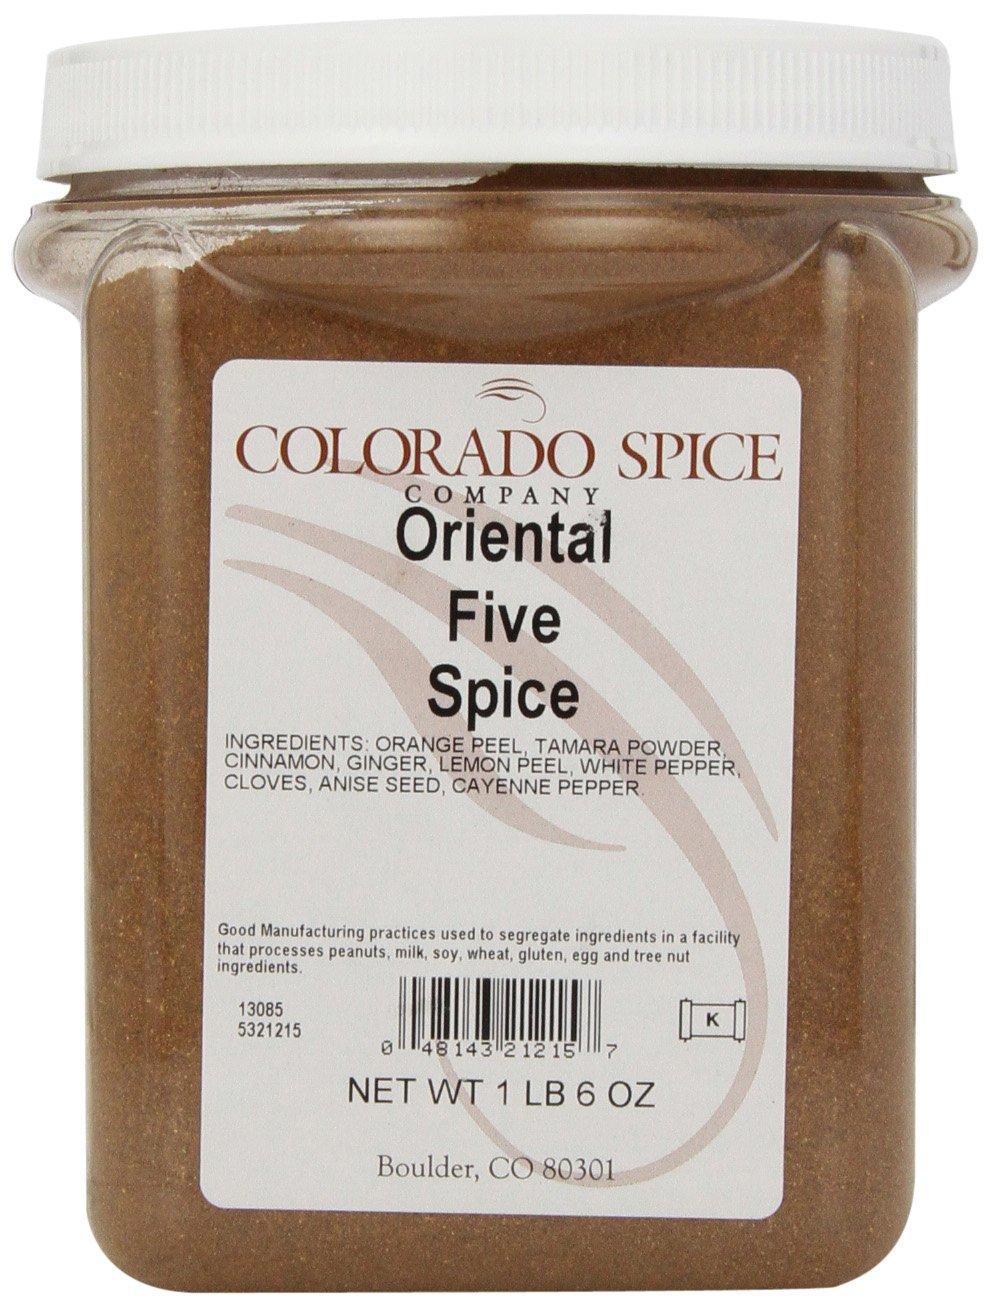 Colorado Spice Oriental Five Spice, 22-Ounce by Colorado Spice (Image #1)